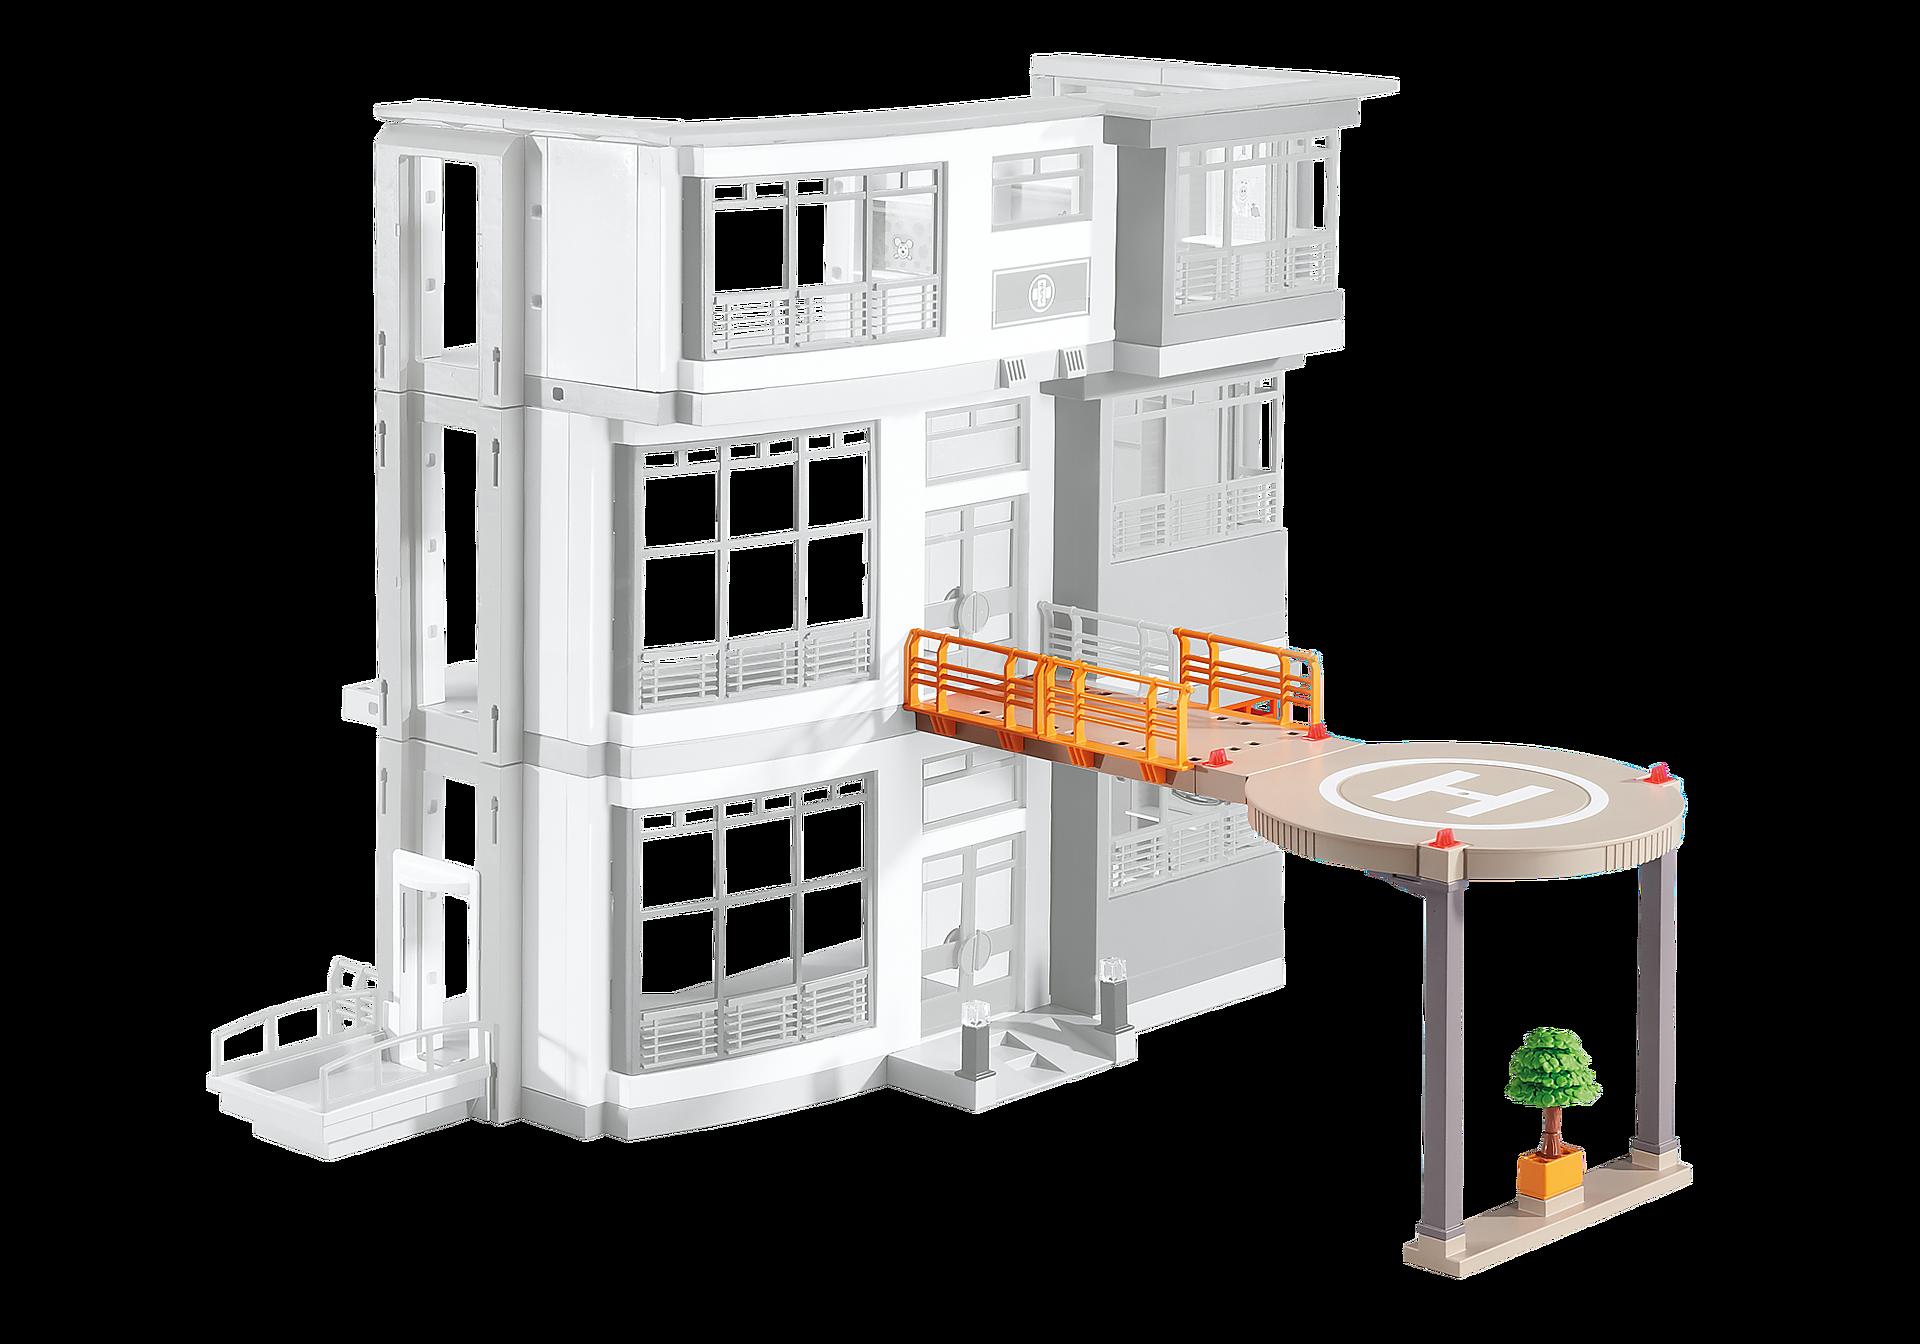 http://media.playmobil.com/i/playmobil/6445_product_detail/Hubschrauberlandeplatz Kinderklinik